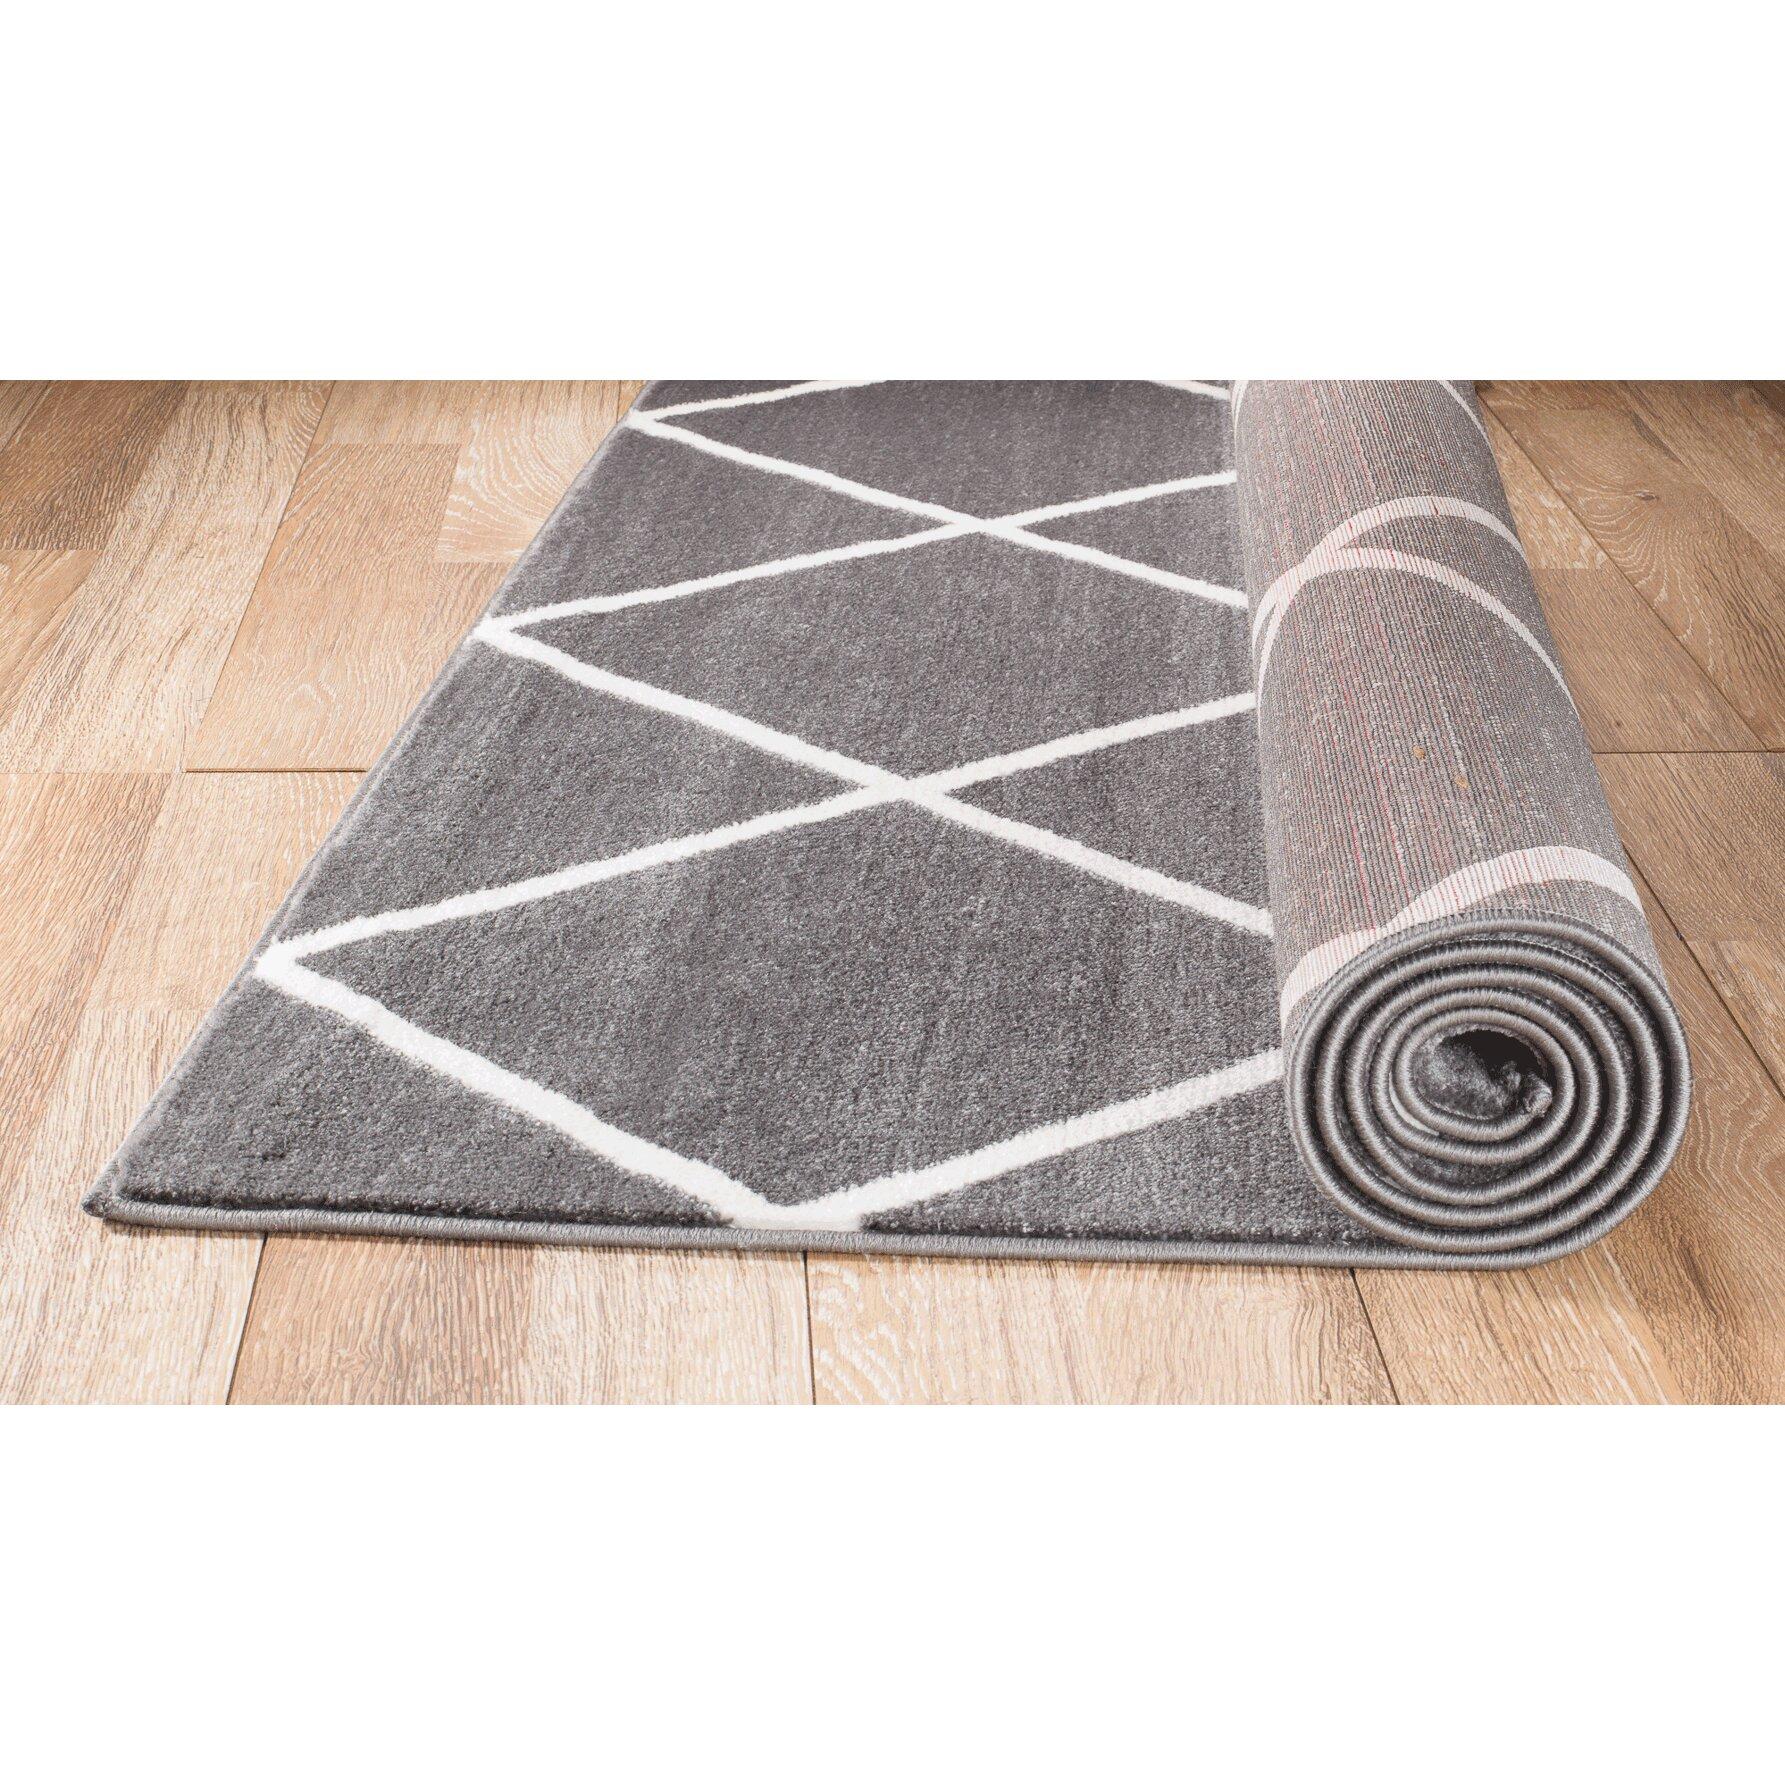 rug and decor inc venice gray white area rug reviews wayfair. Black Bedroom Furniture Sets. Home Design Ideas